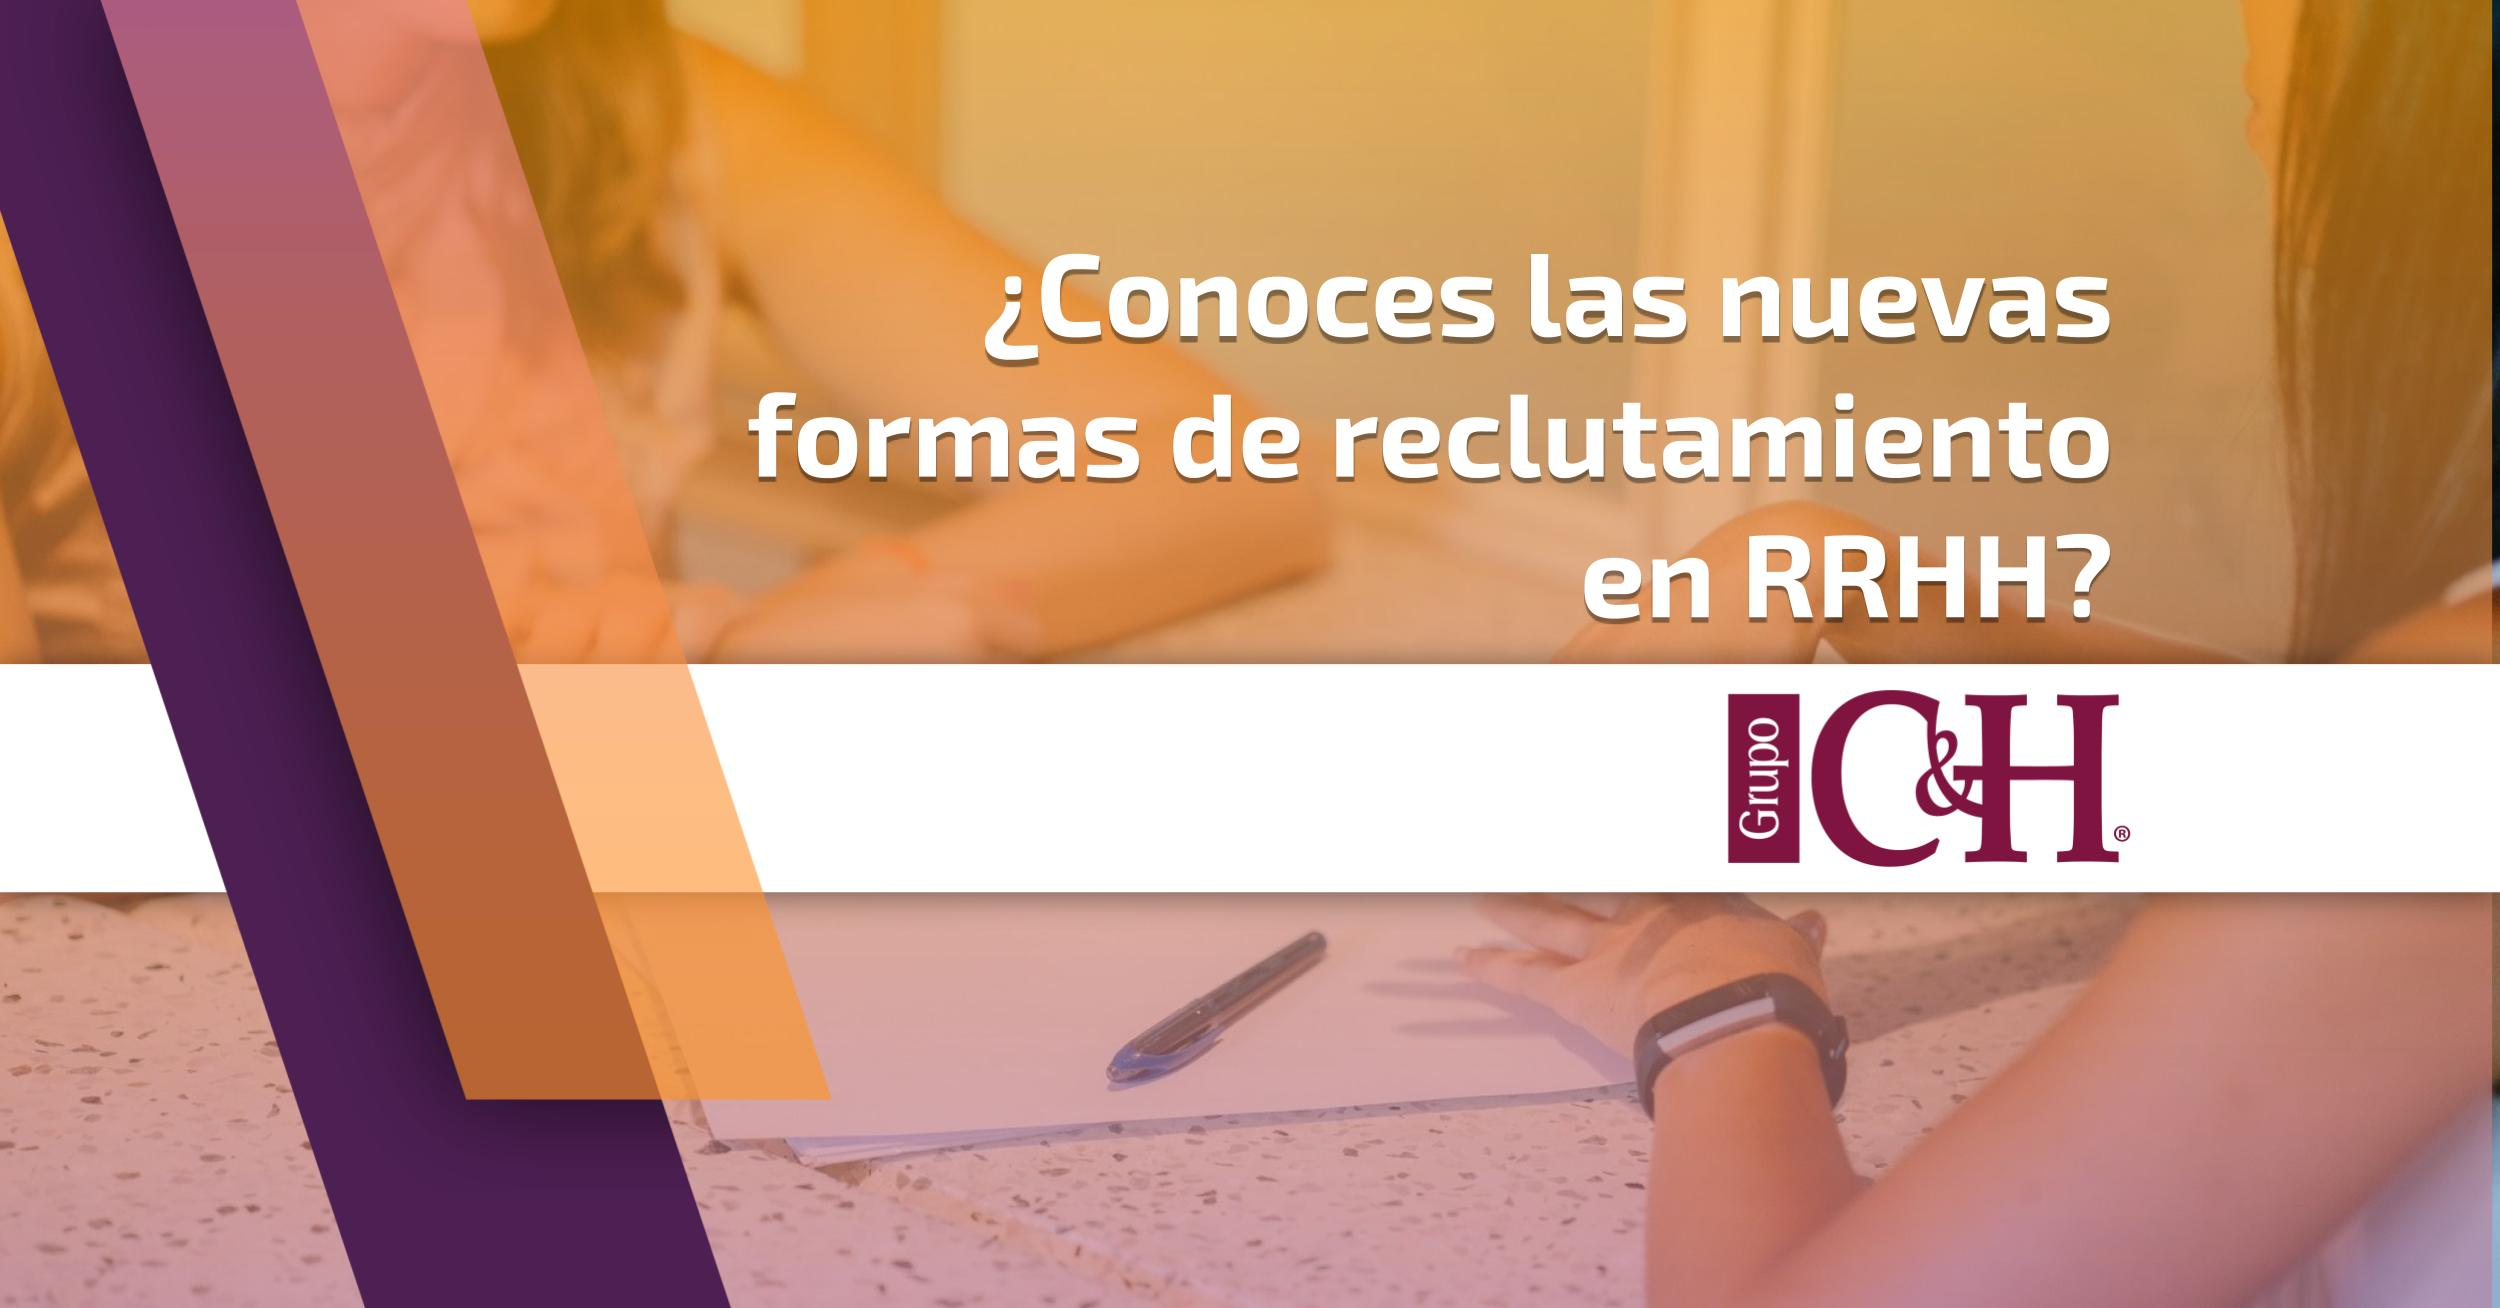 reclutamiento_RRHH